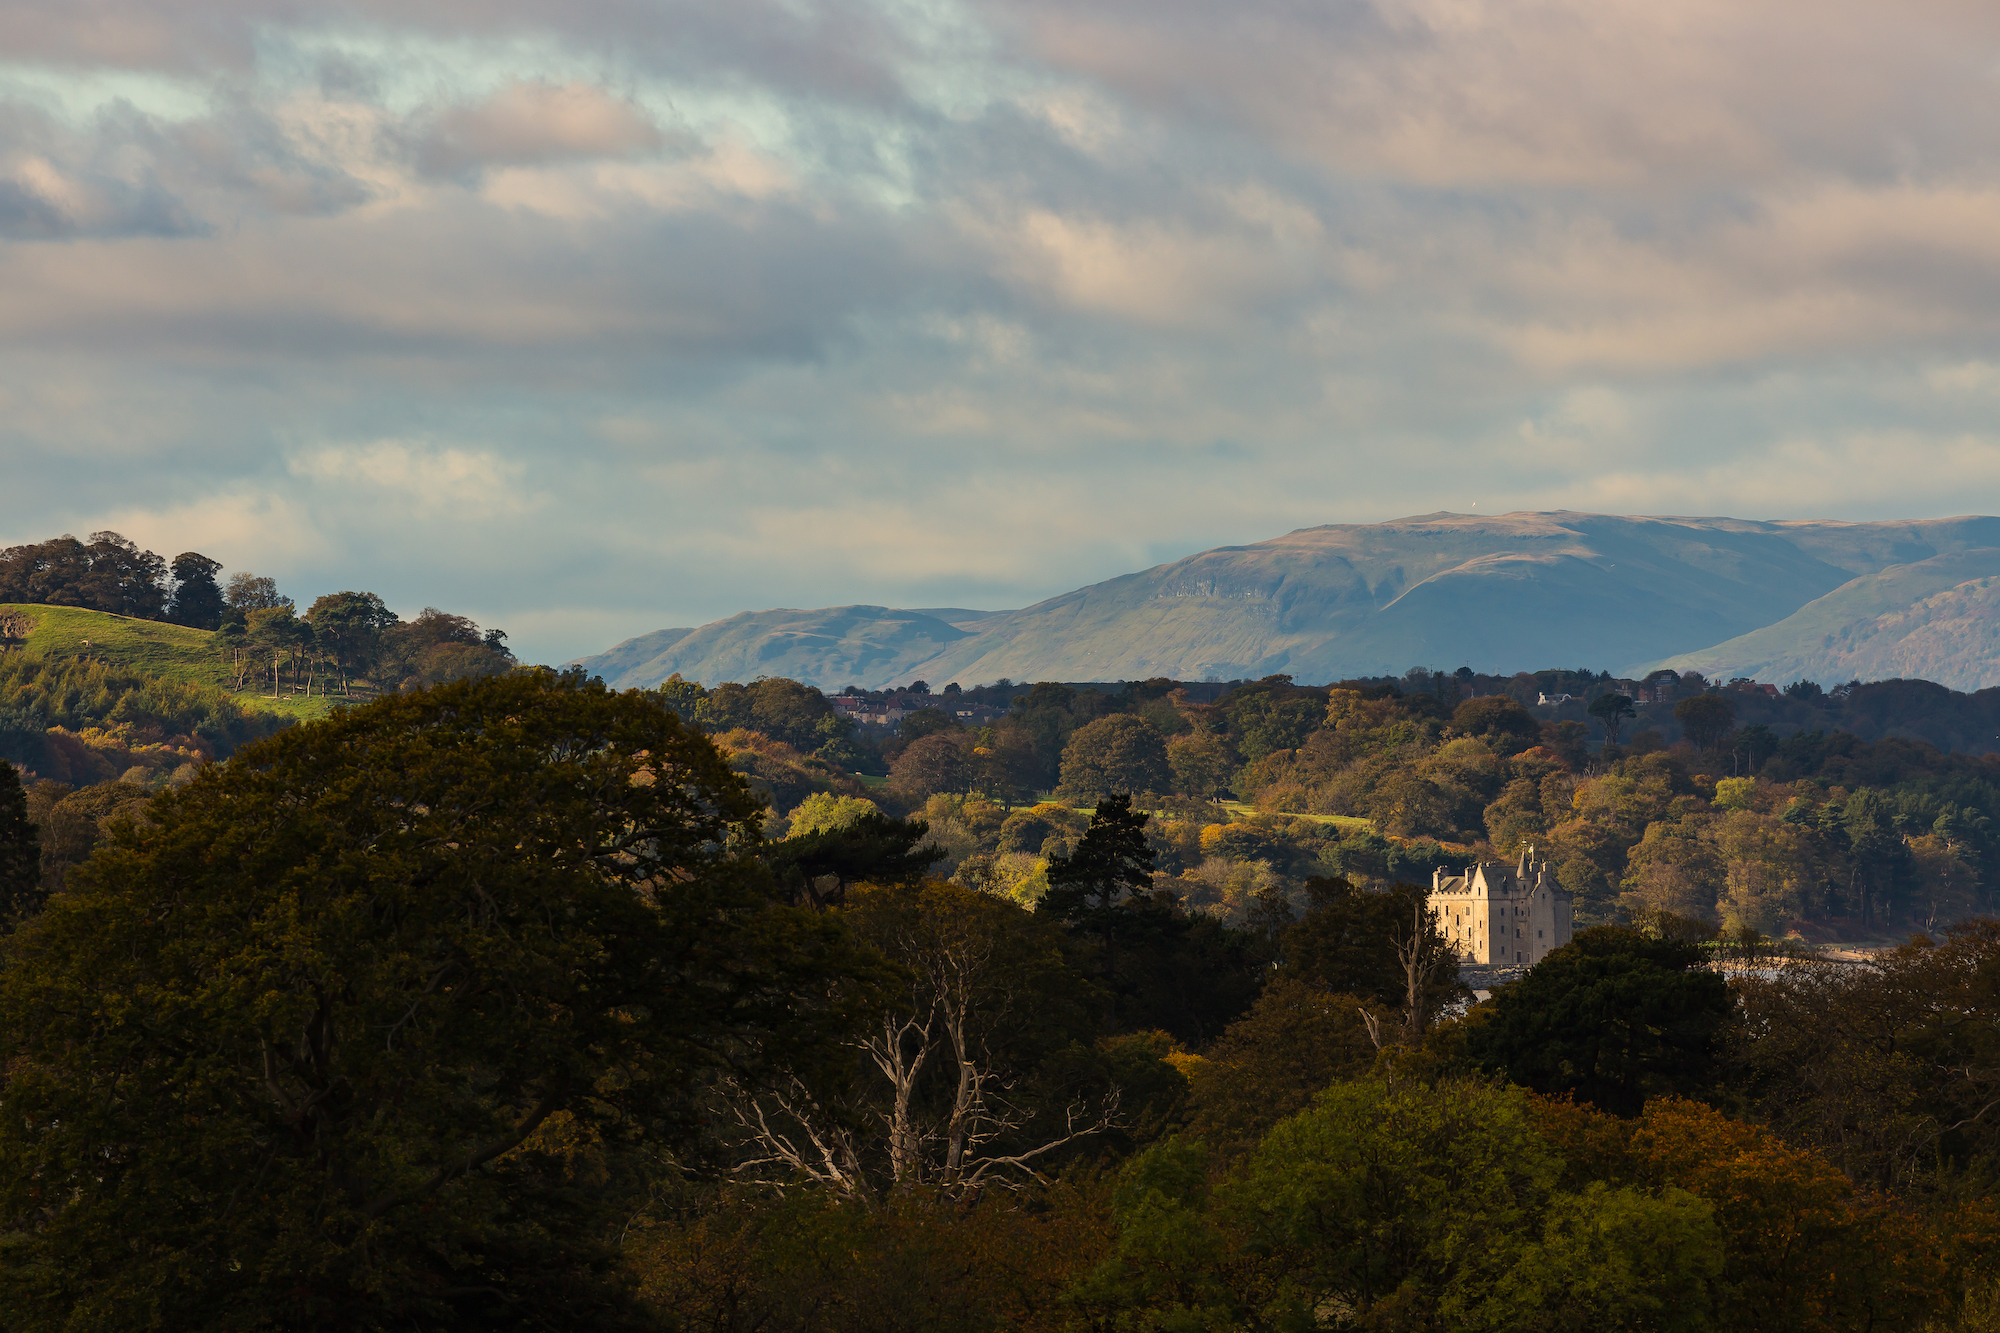 (819) Barnbougle Castle, Scots Baronial Style Tower House, Dalmeny Estate, Earl of Rosebery Estate, Queensferry, Firth of Forth, Edinburgh, Scotland. Copyright David Wheater.jpg